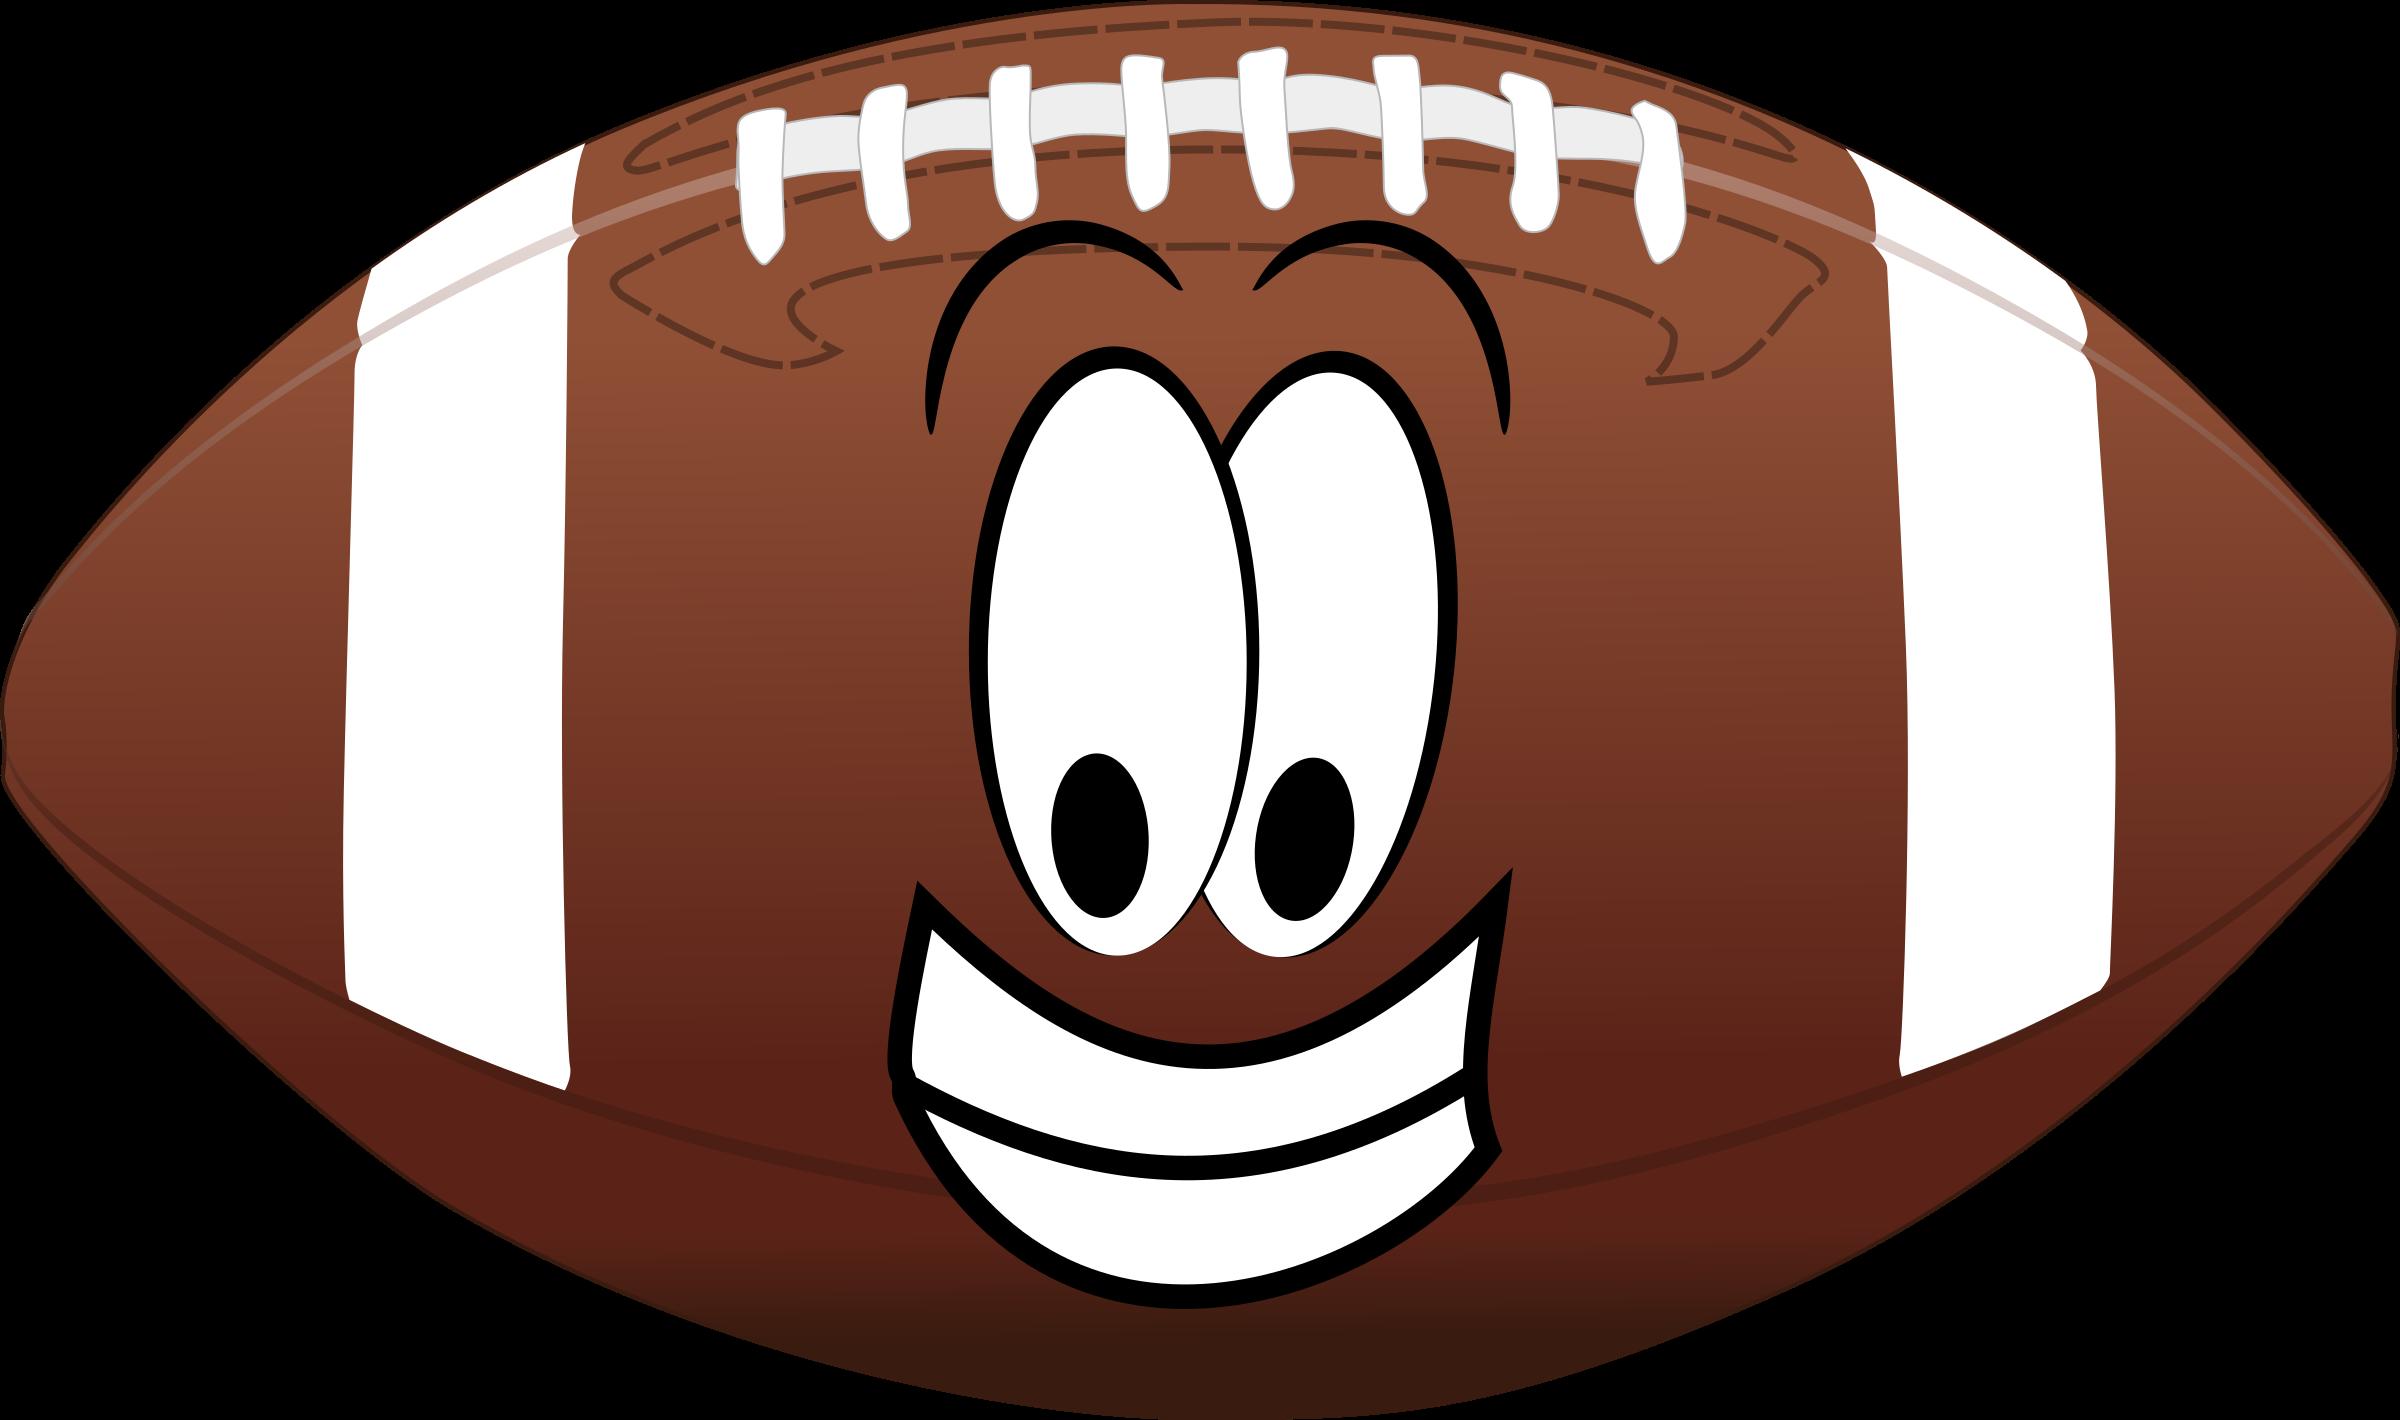 2400x1420 Happy Football Vector Clipart Image